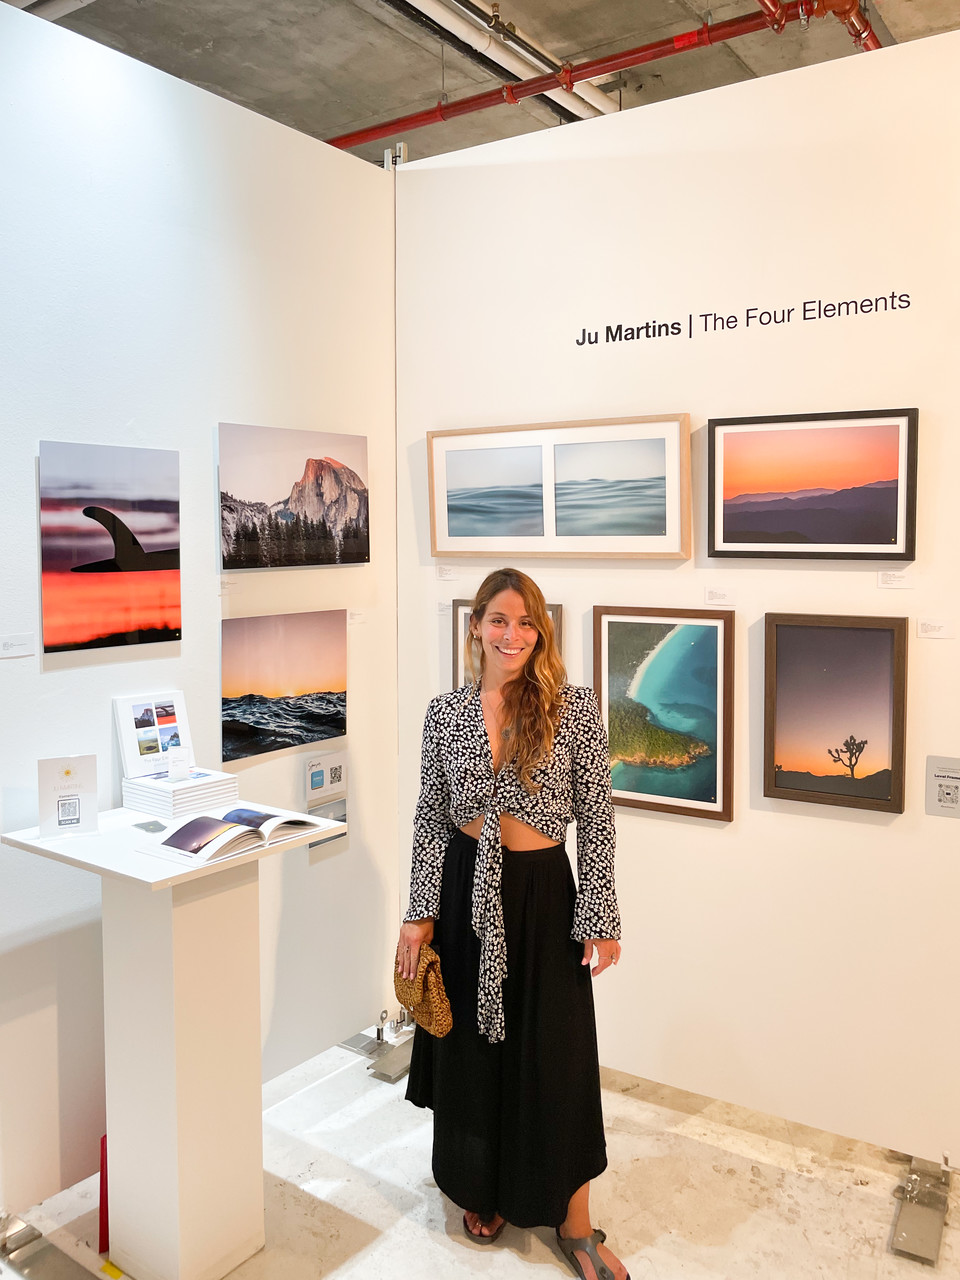 Ju Martins custom framed photos at the Clio Art Fair 2021